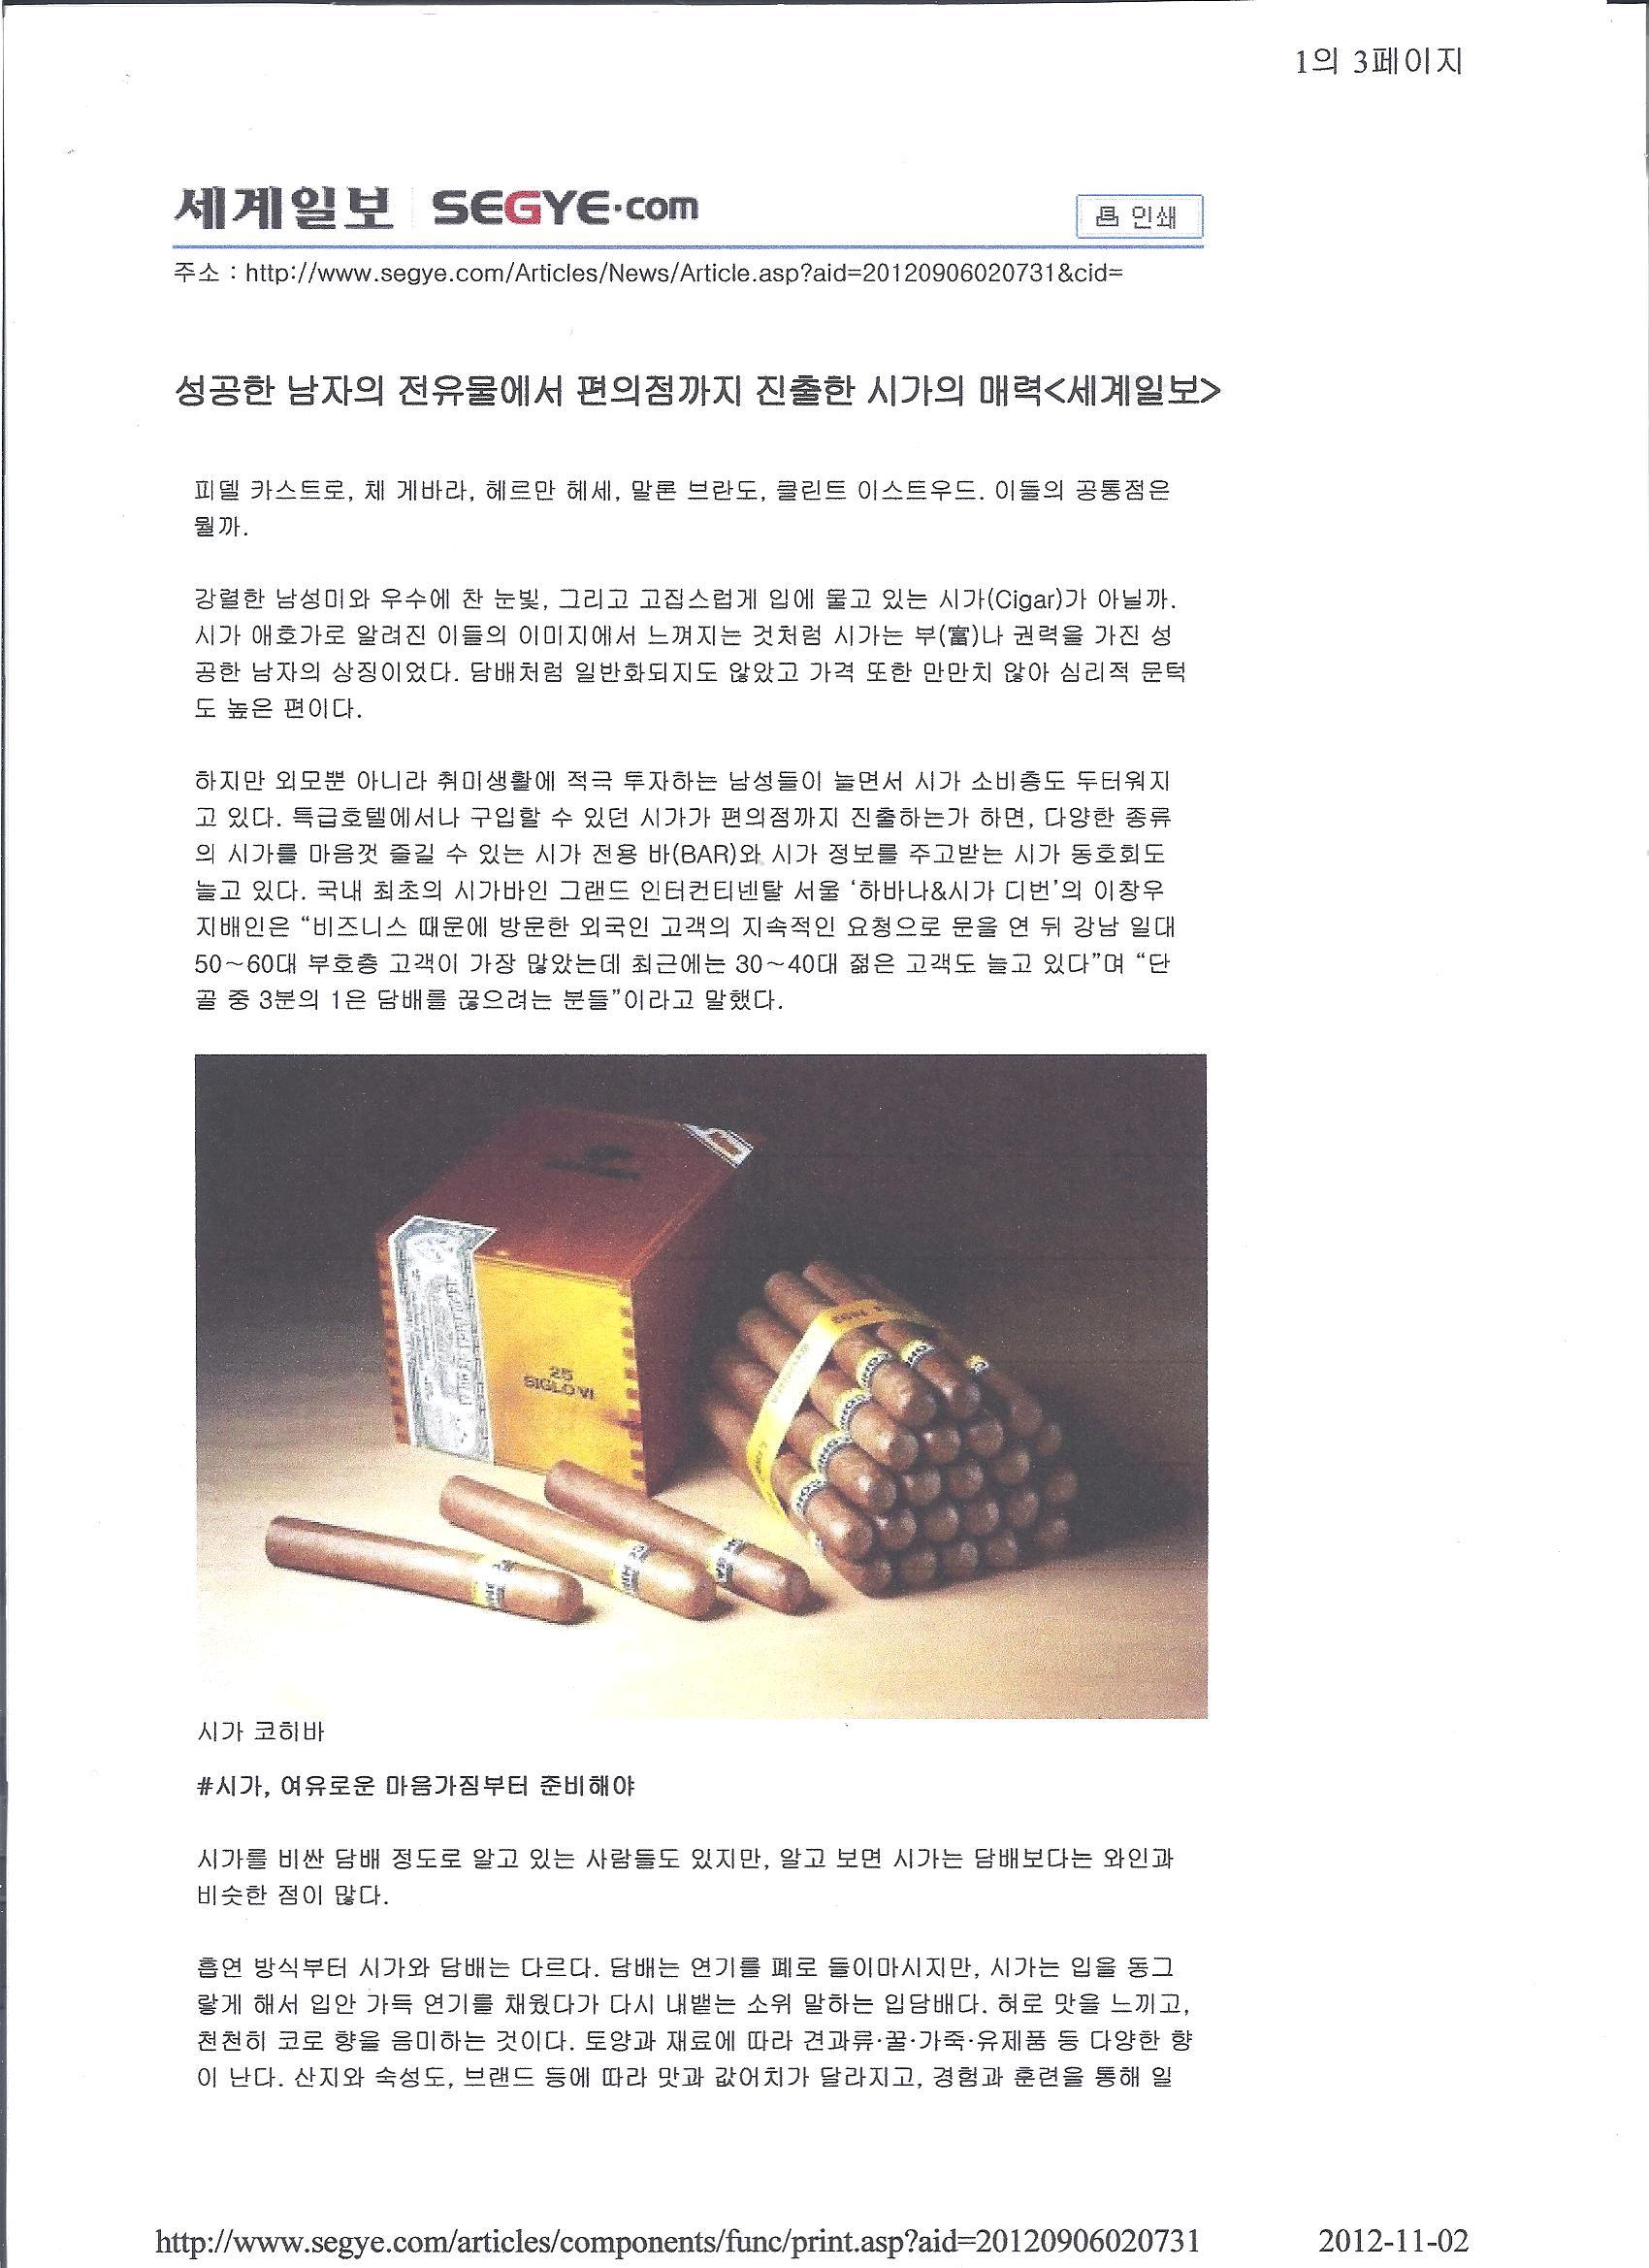 2012-9 Segye article 1.jpg